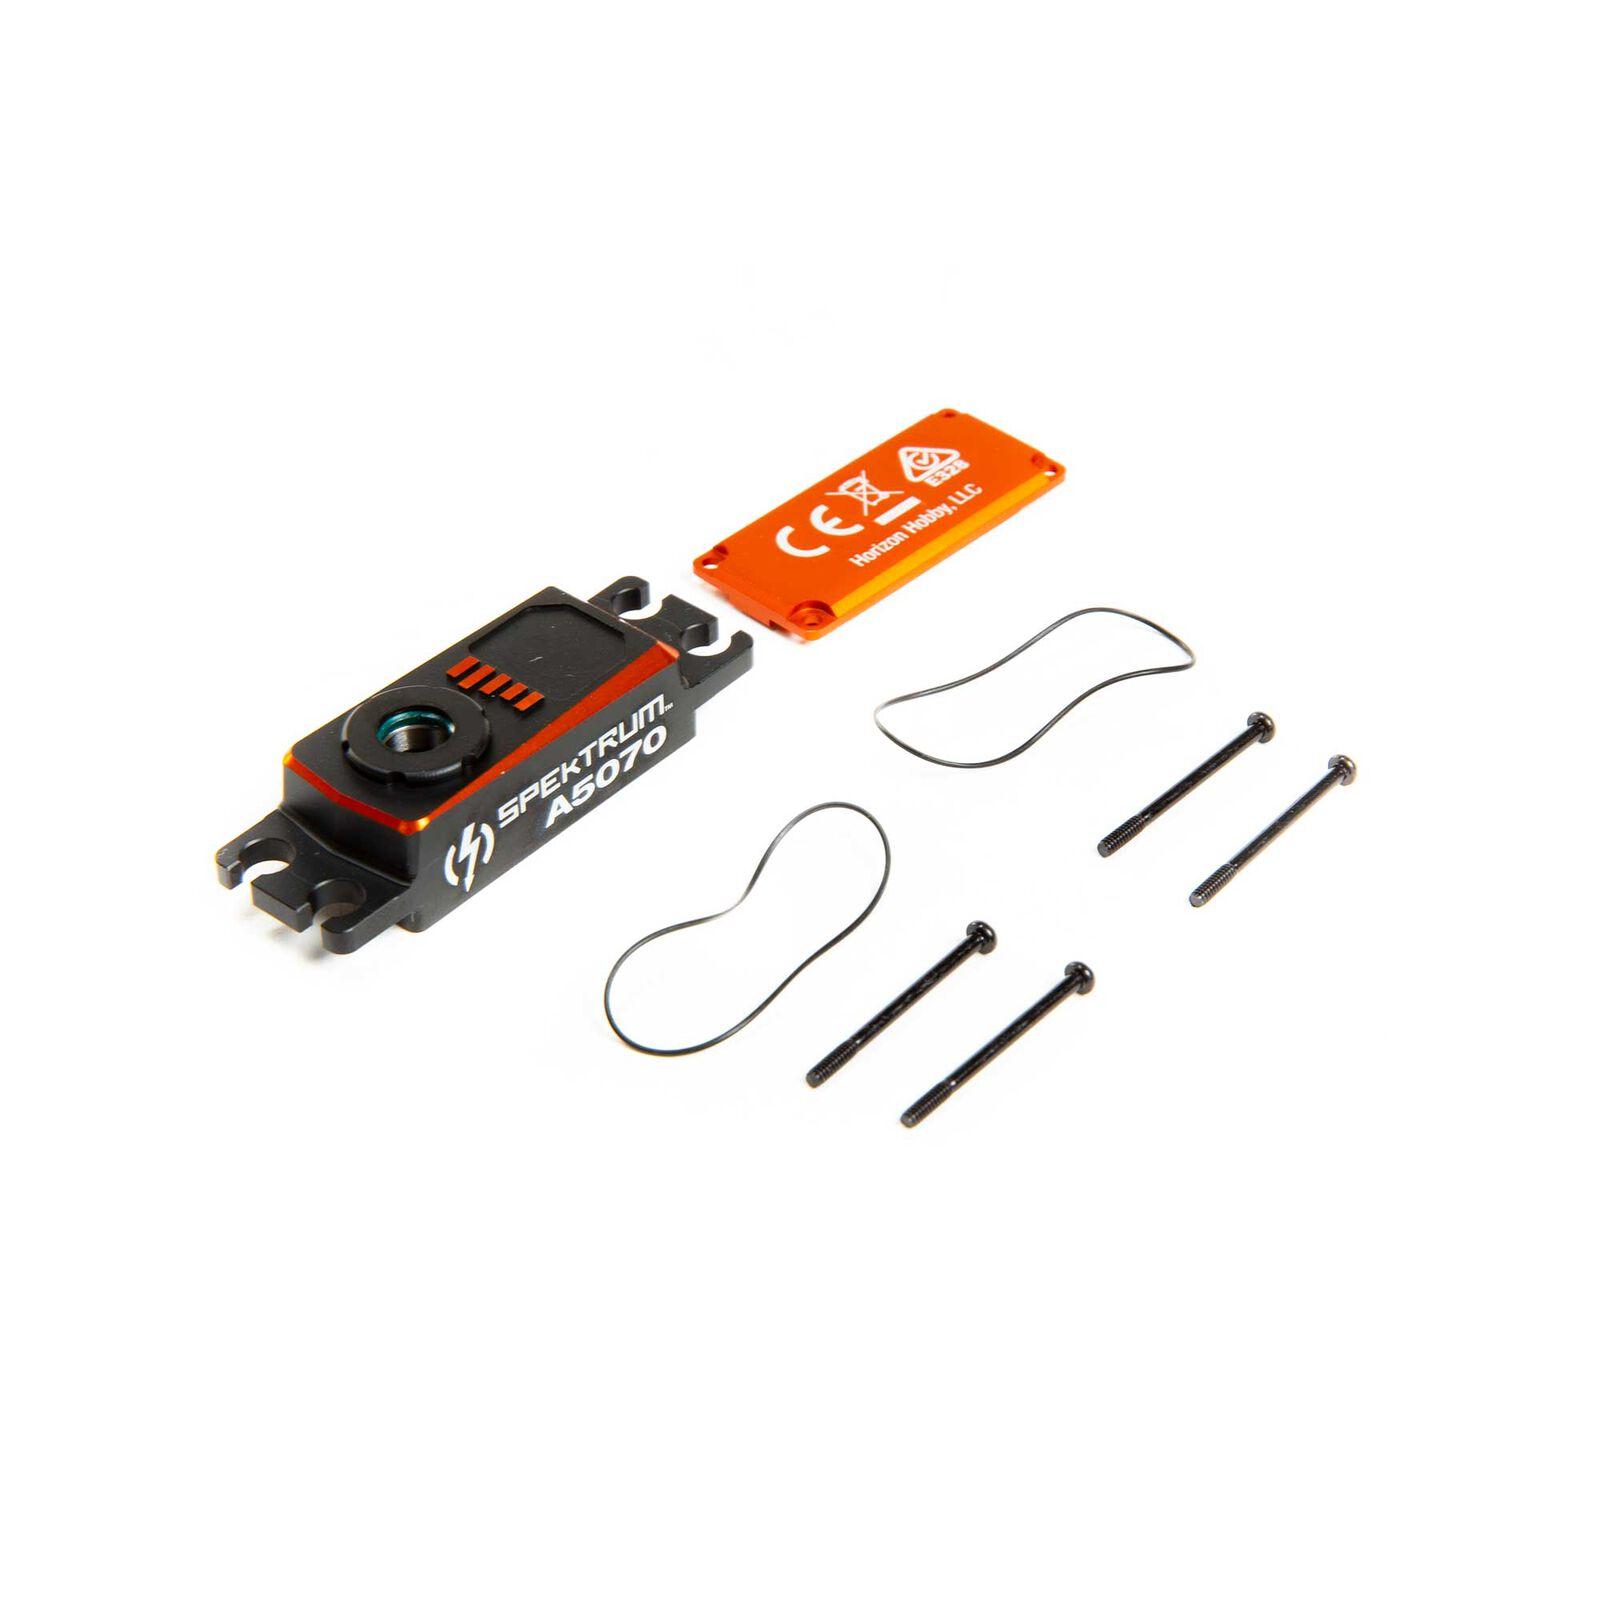 Case Set: A5070 Mini Servo